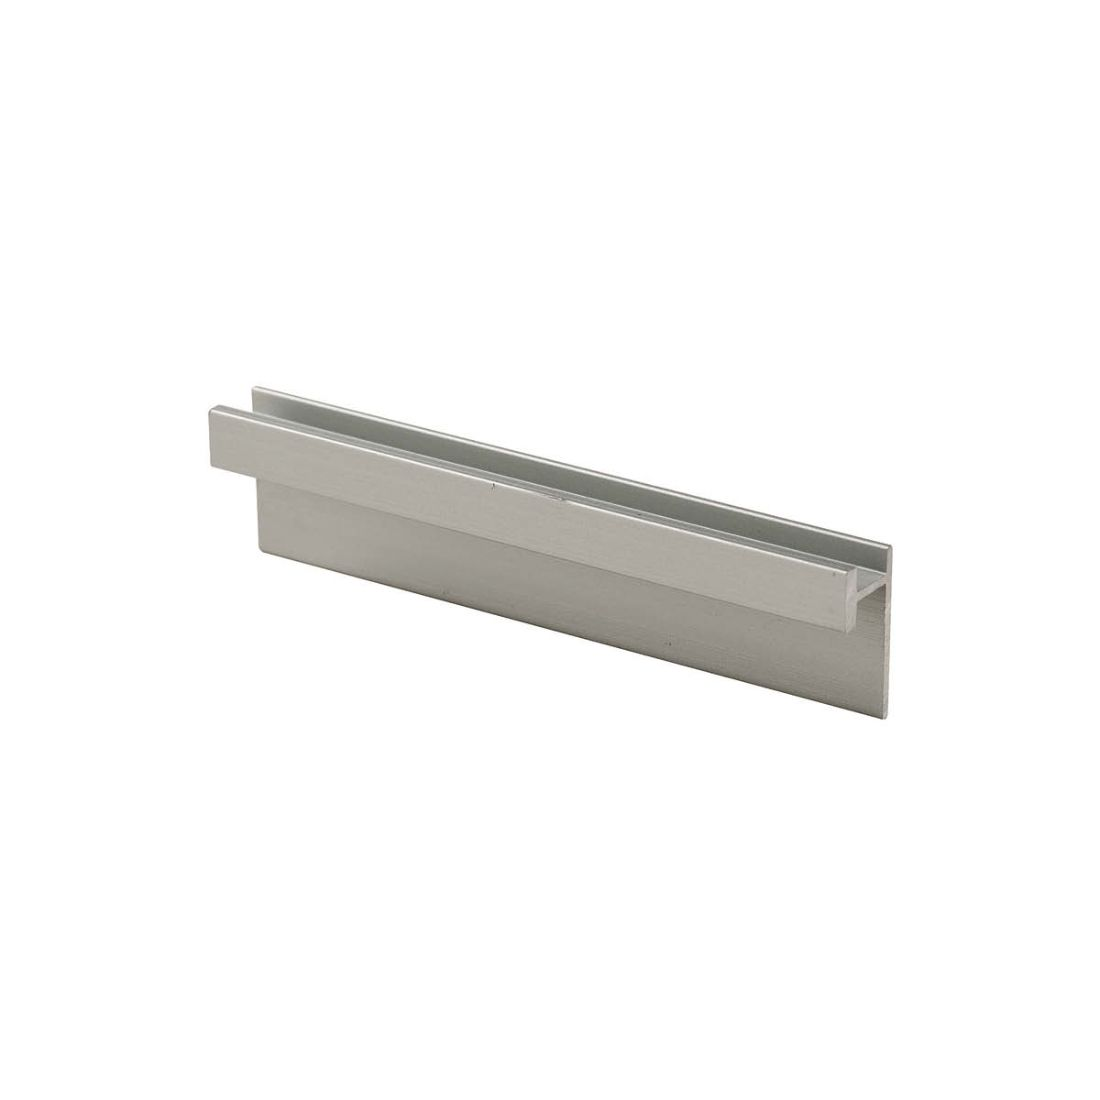 Aluminium H Jointer Moonshine 2700 x 4.5mm